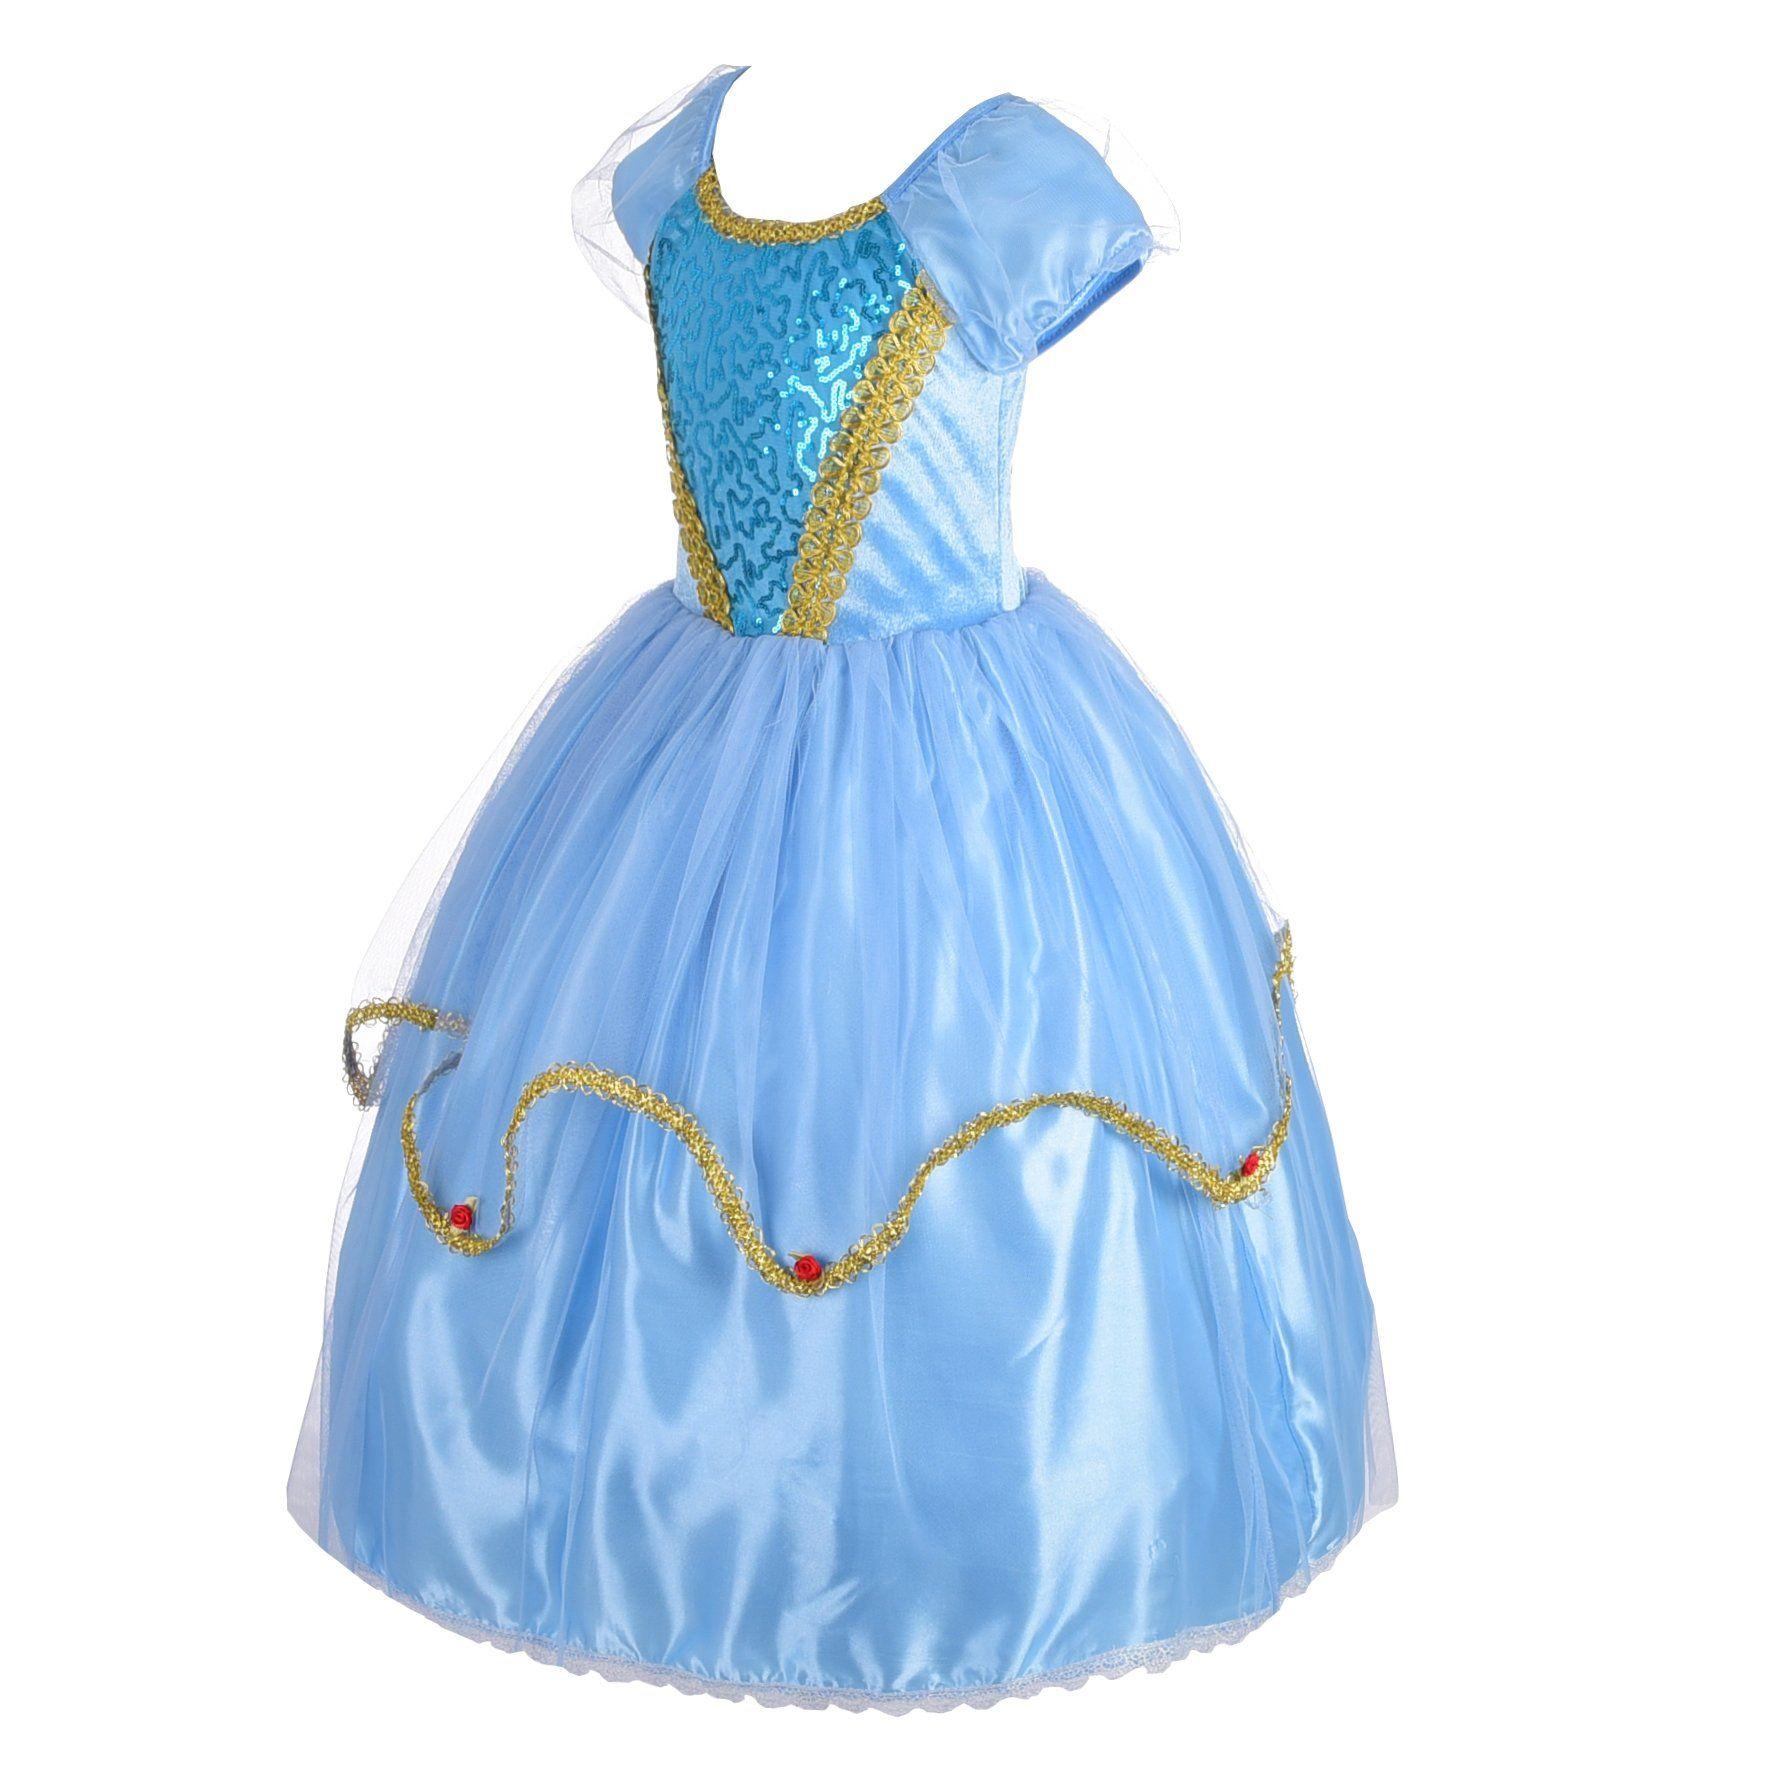 Dressy Daisy Girls Princess Cinderella Costumes Halloween Party Princess Dress Up